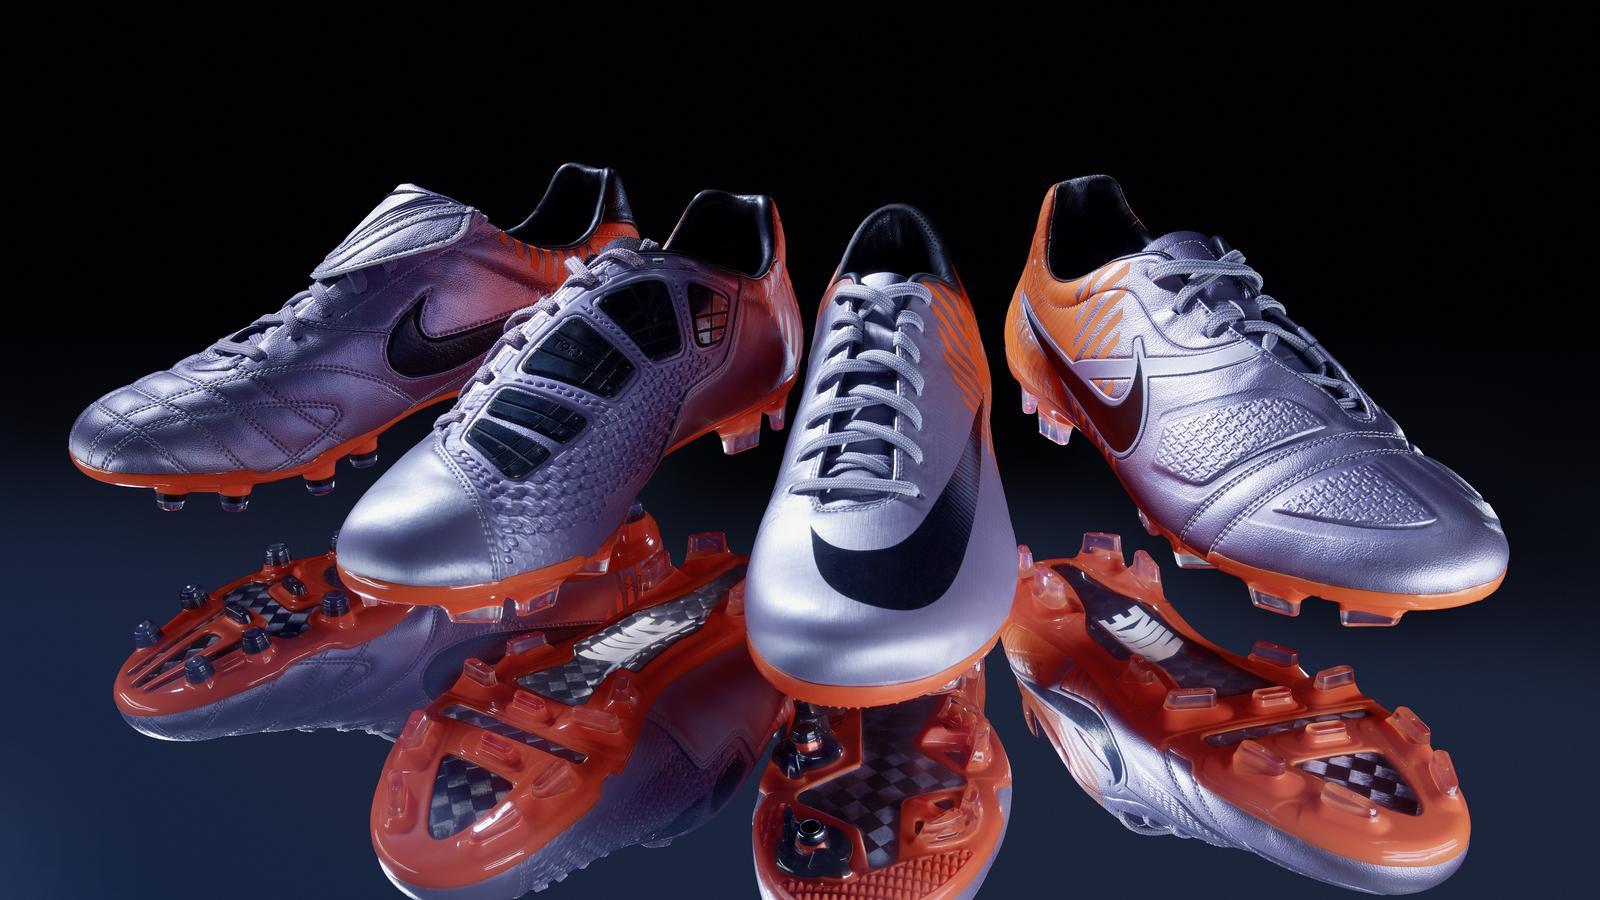 discordia Beca hará  Nike Sportswear Fall 2010 - Nike News